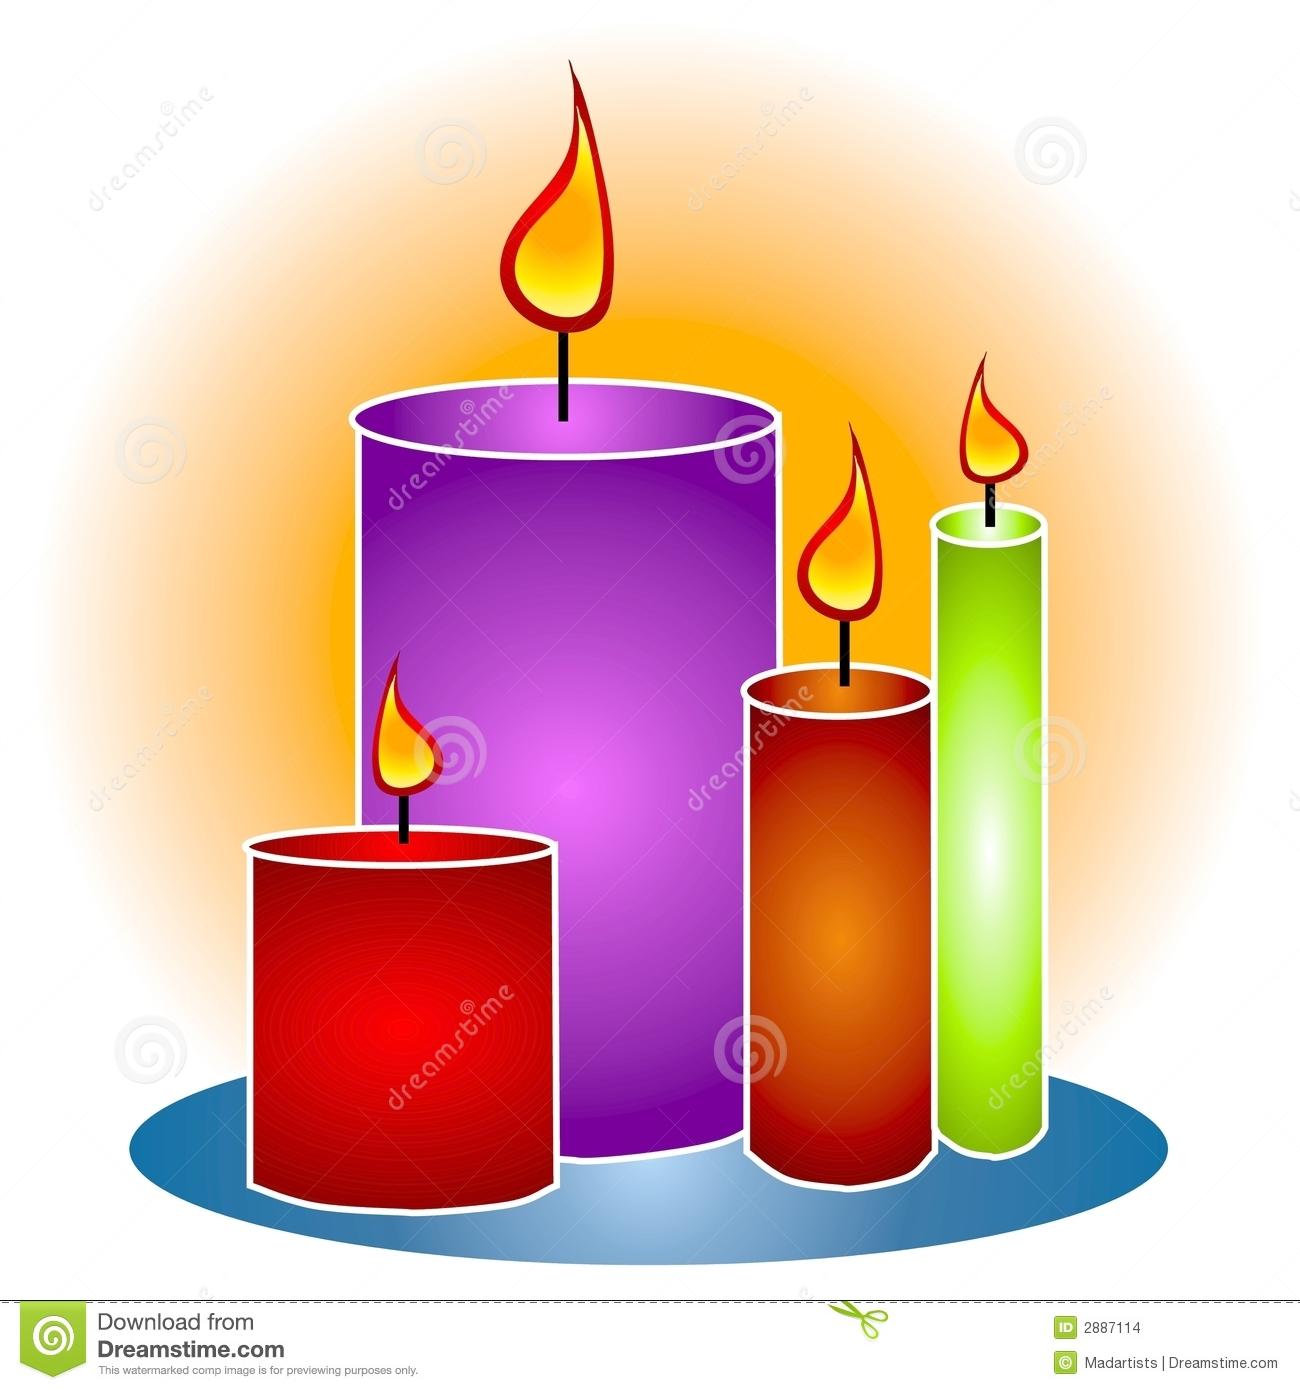 Candle Clip Art - Candle Clip Art